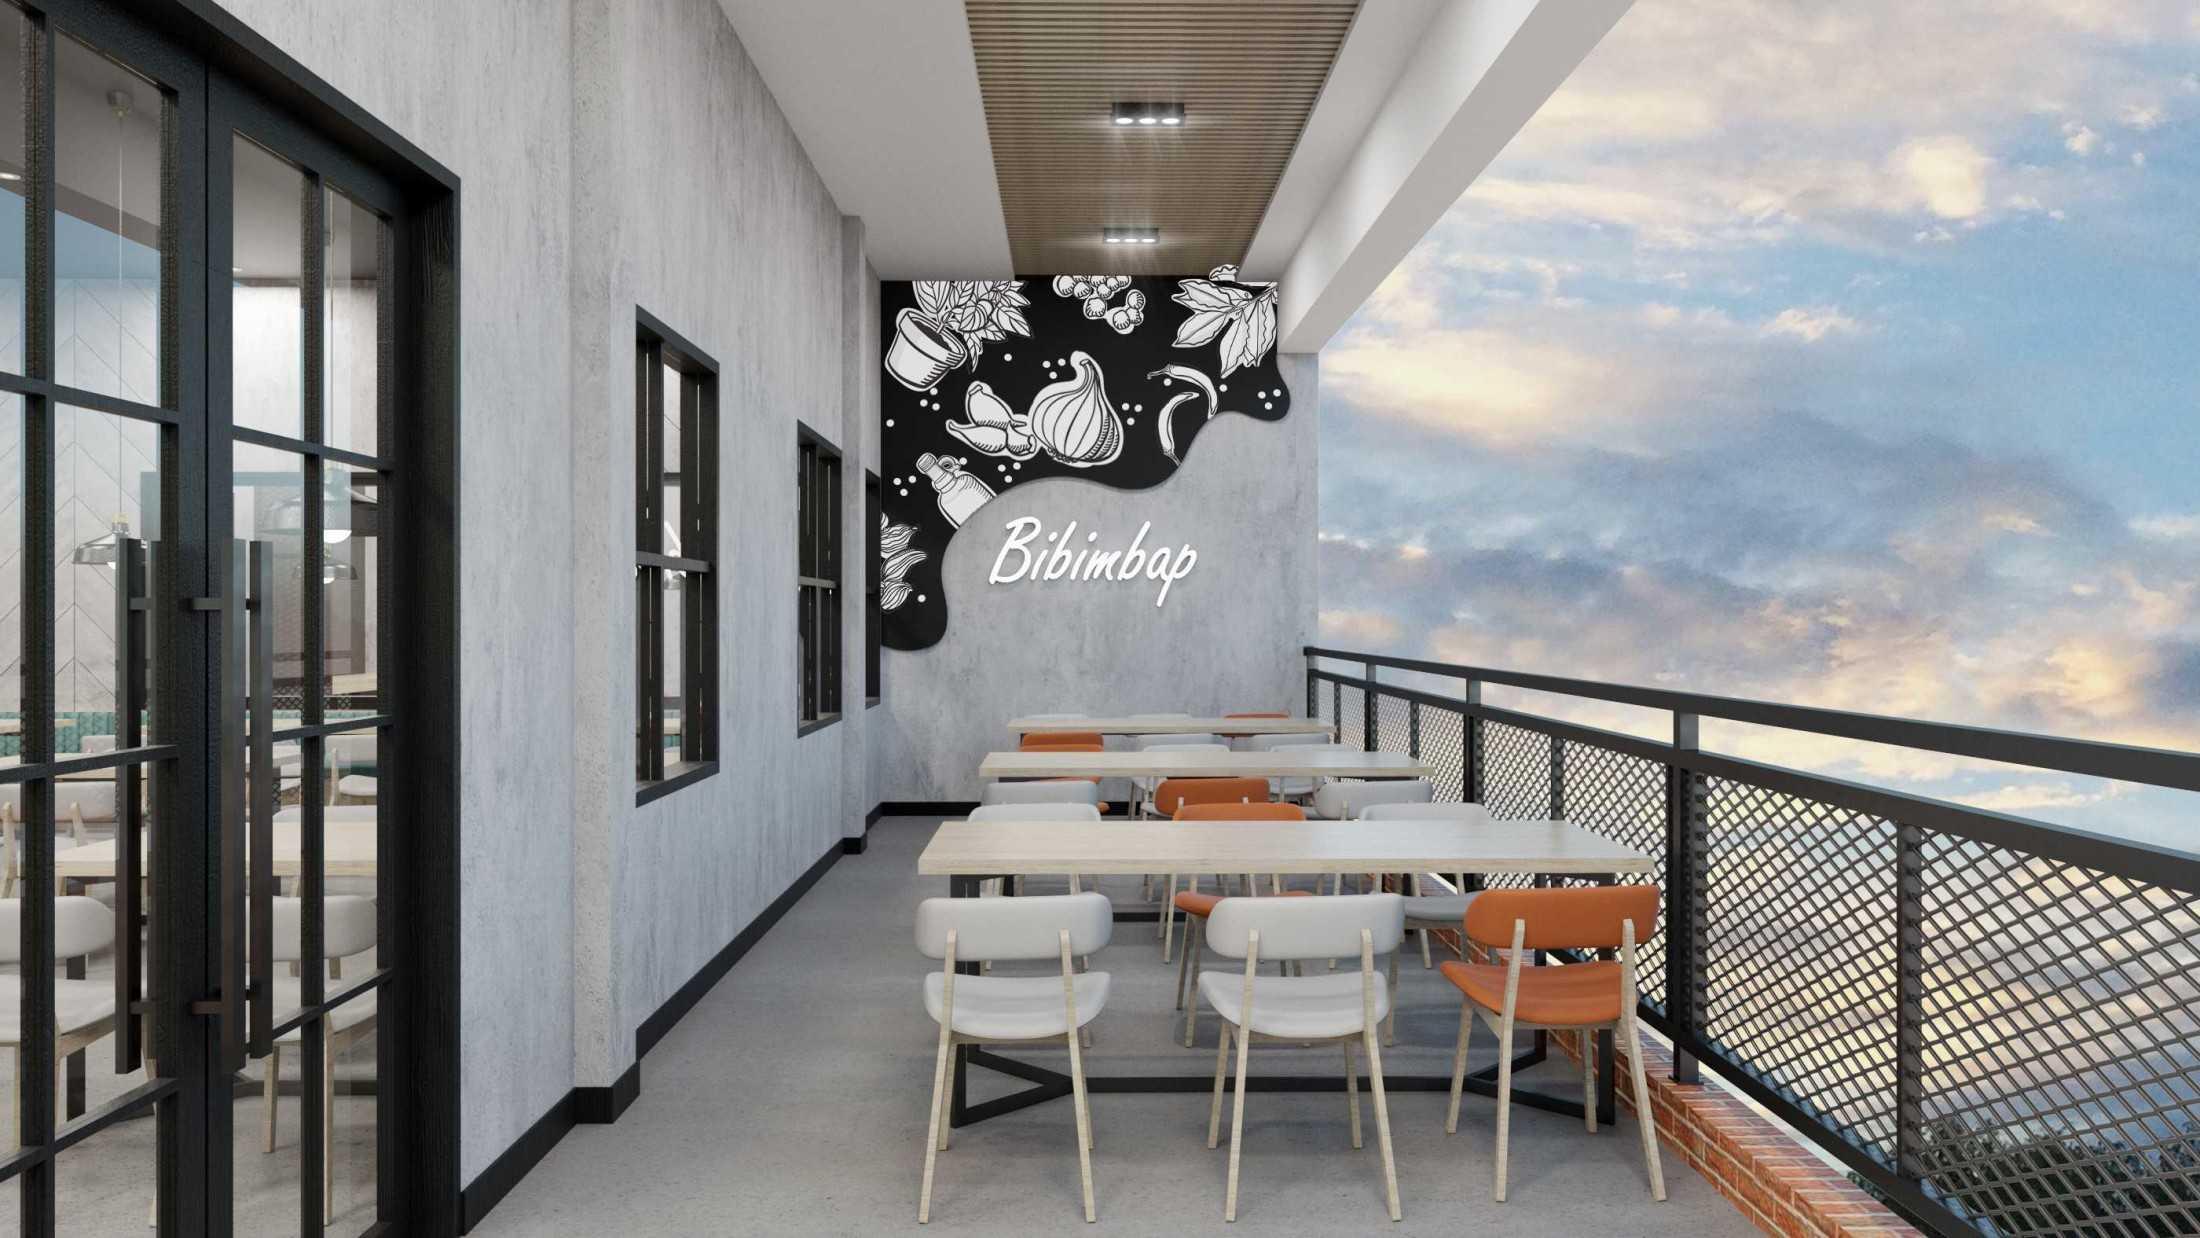 Tata Griya Nusantara Restaurant - Bali Bali, Indonesia Bali, Indonesia Tata-Griya-Nusantara-Restaurant-Bali  113694